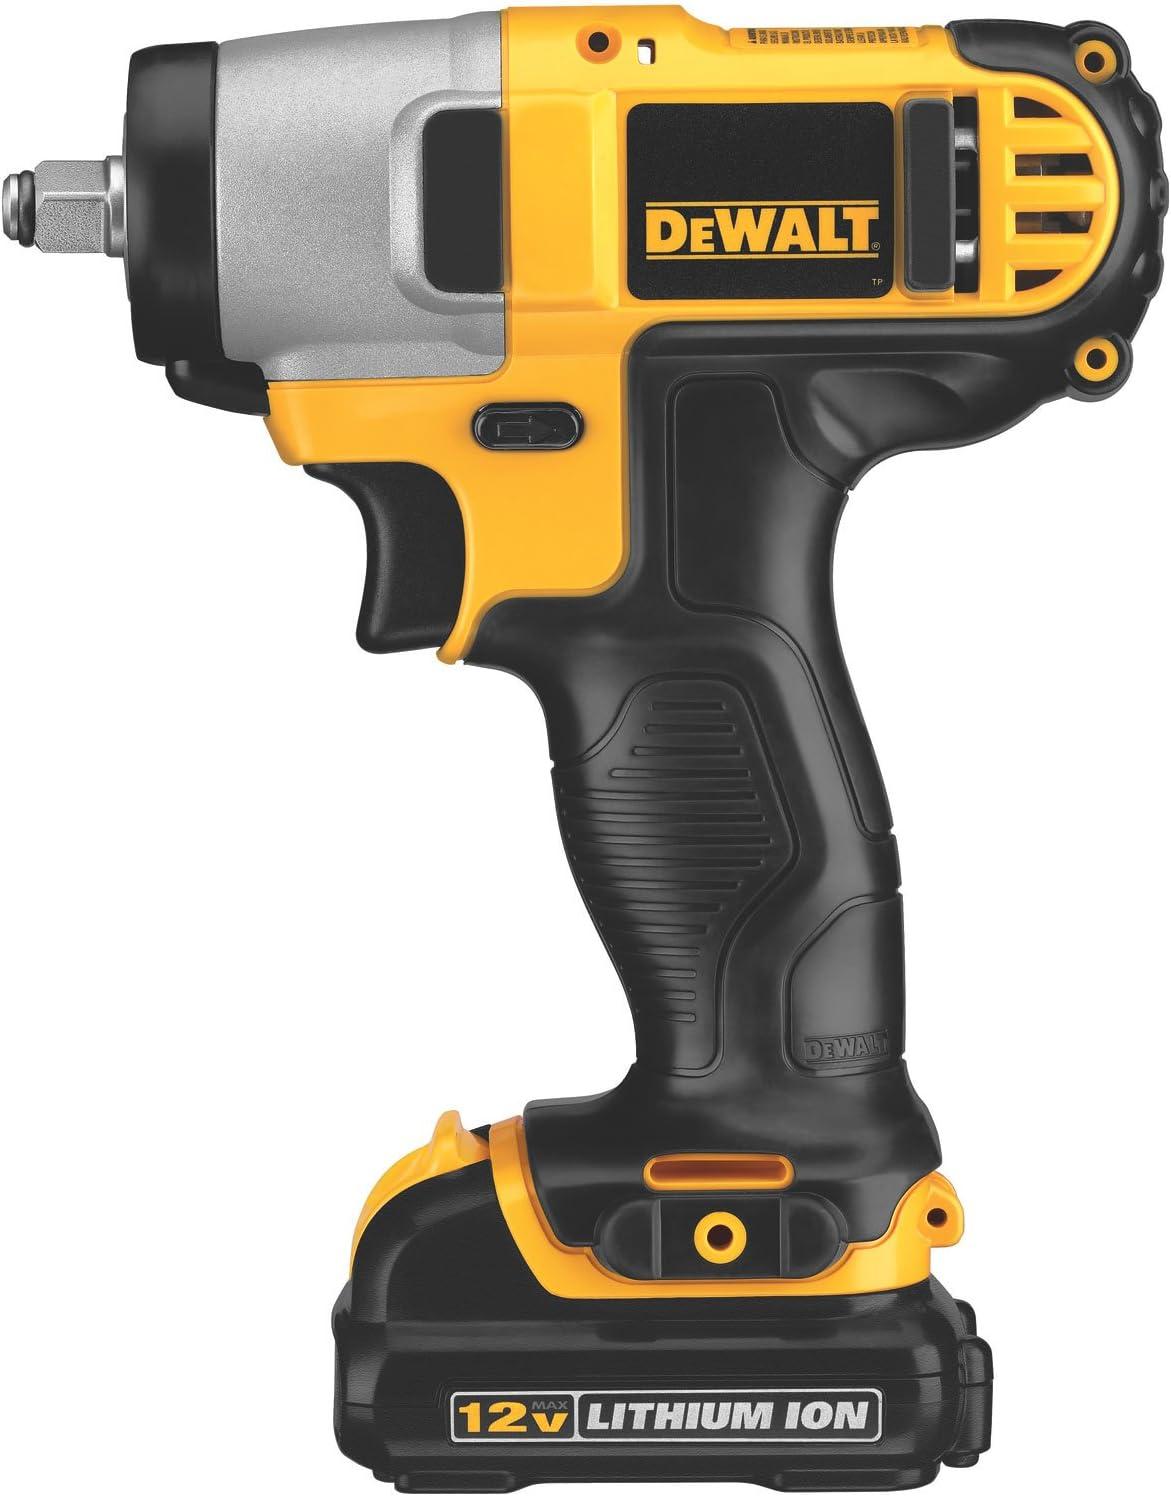 DEWALT DCF813S2 12-Volt Max 3 8-Inch Impact Wrench Kit